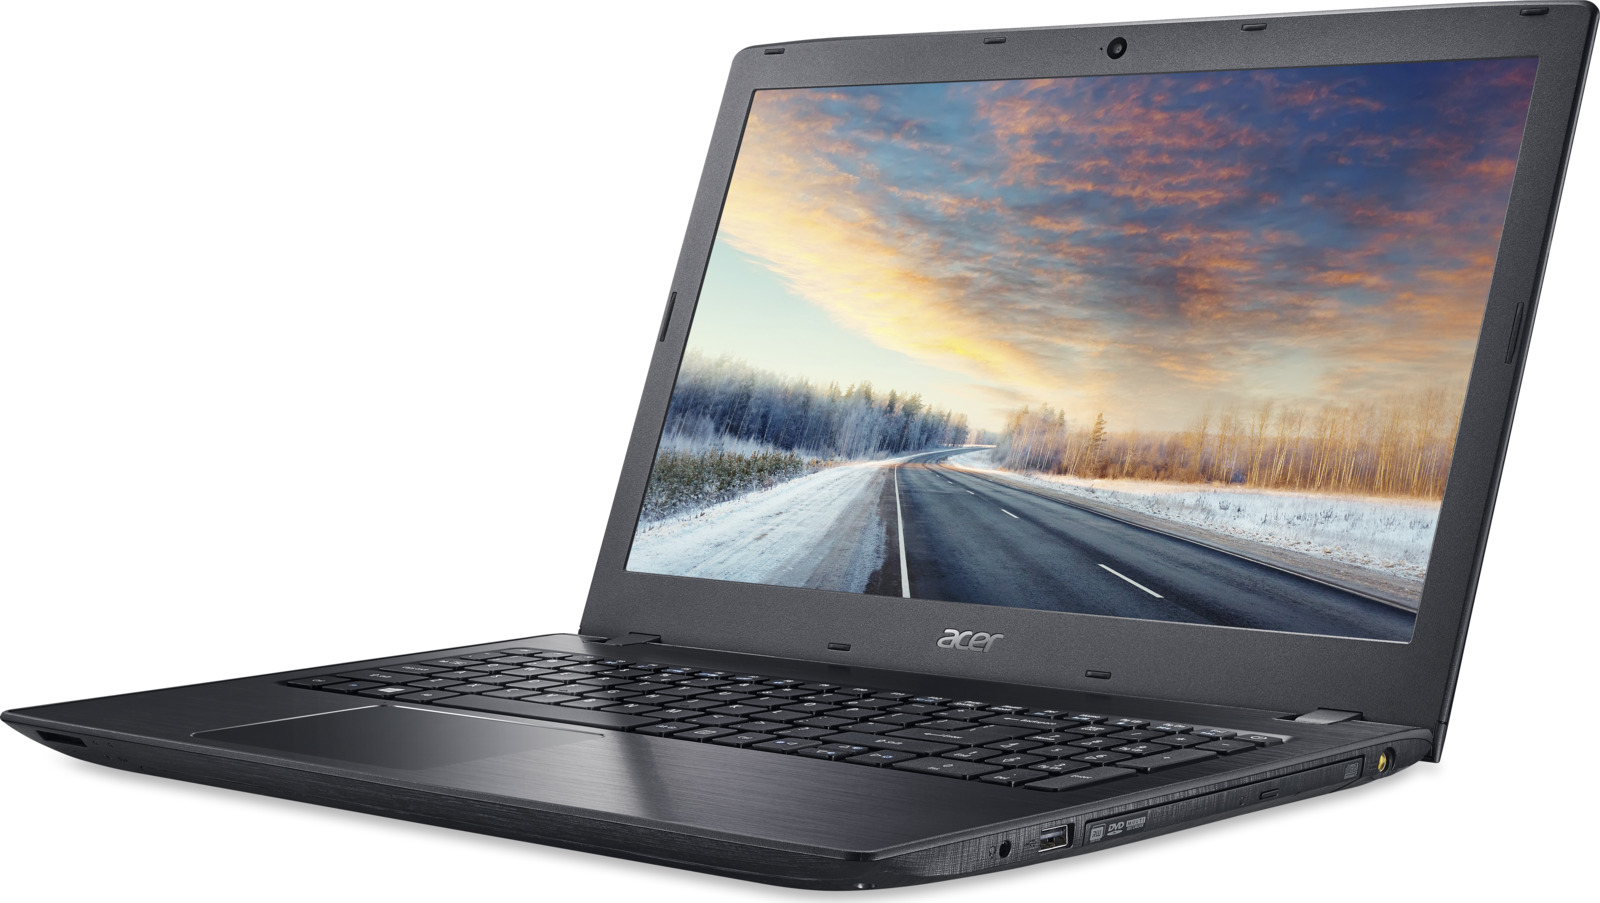 Ноутбук Acer TravelMate TMP259-G2, NX.VEPER.040, 15.6, черный ноутбук 10 дюймов